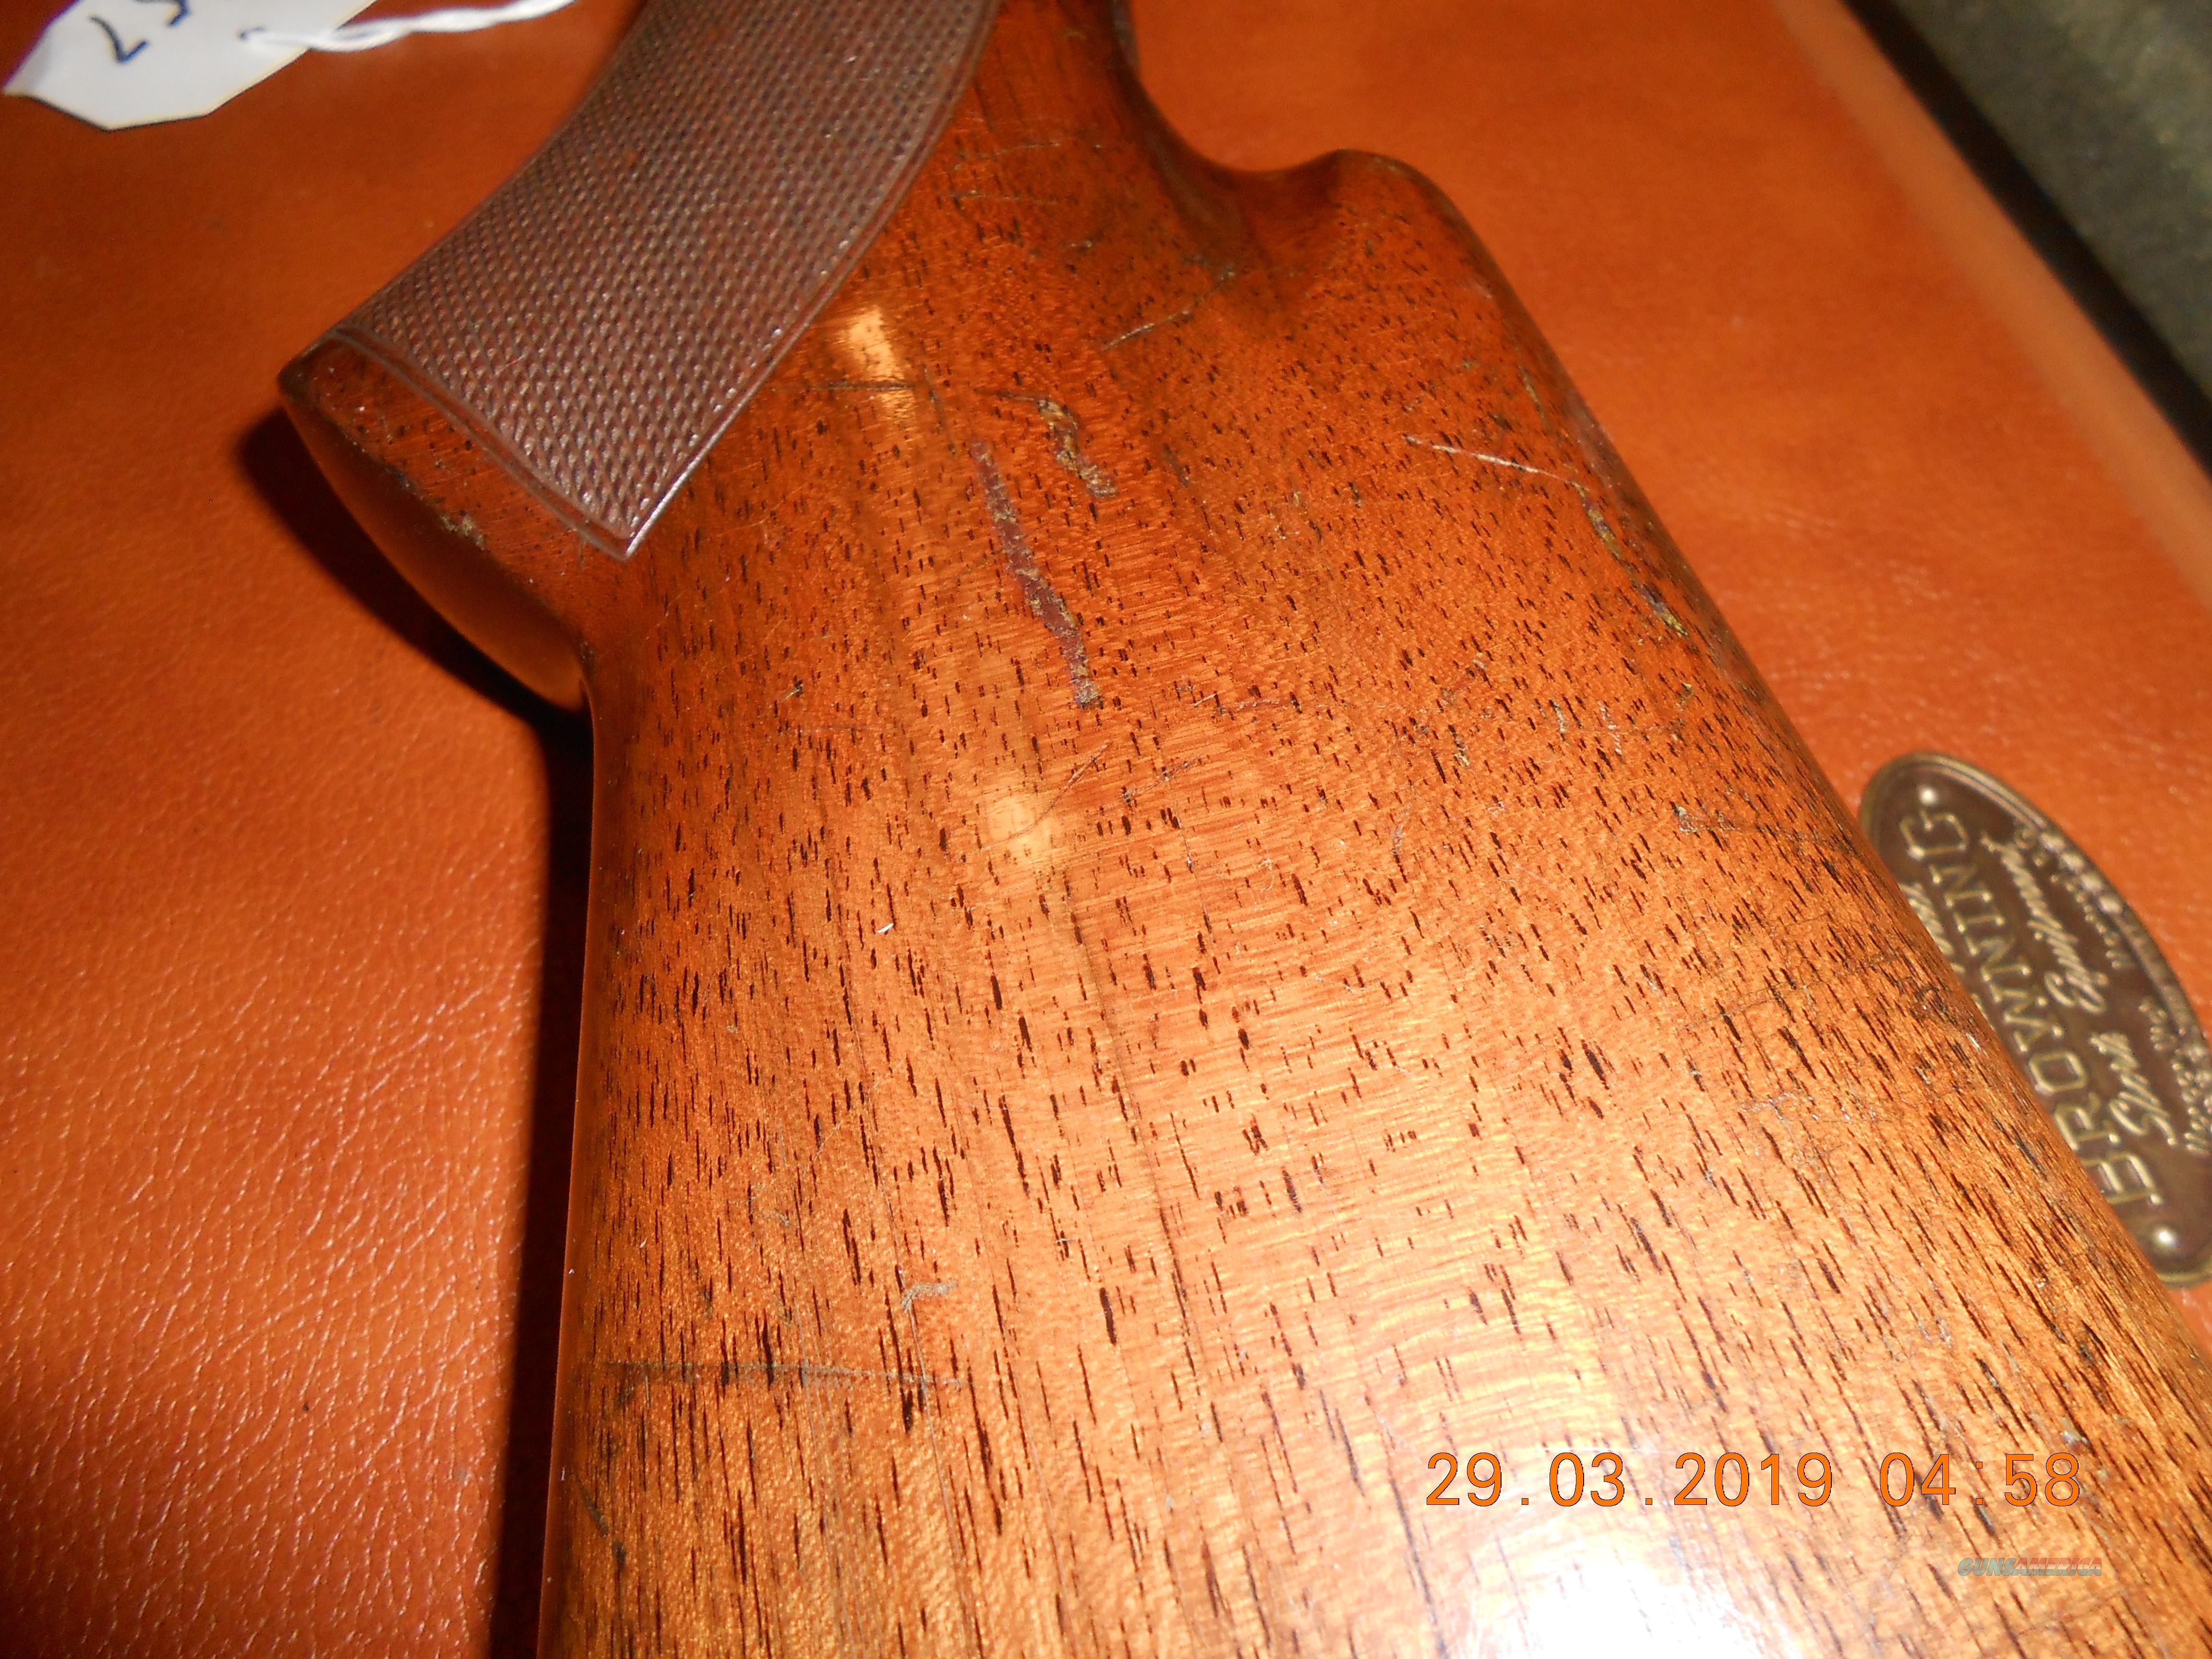 Browning Shotguns from Daniel Auction 3/2/19  Guns > Shotguns > Browning Shotguns > Autoloaders > Hunting